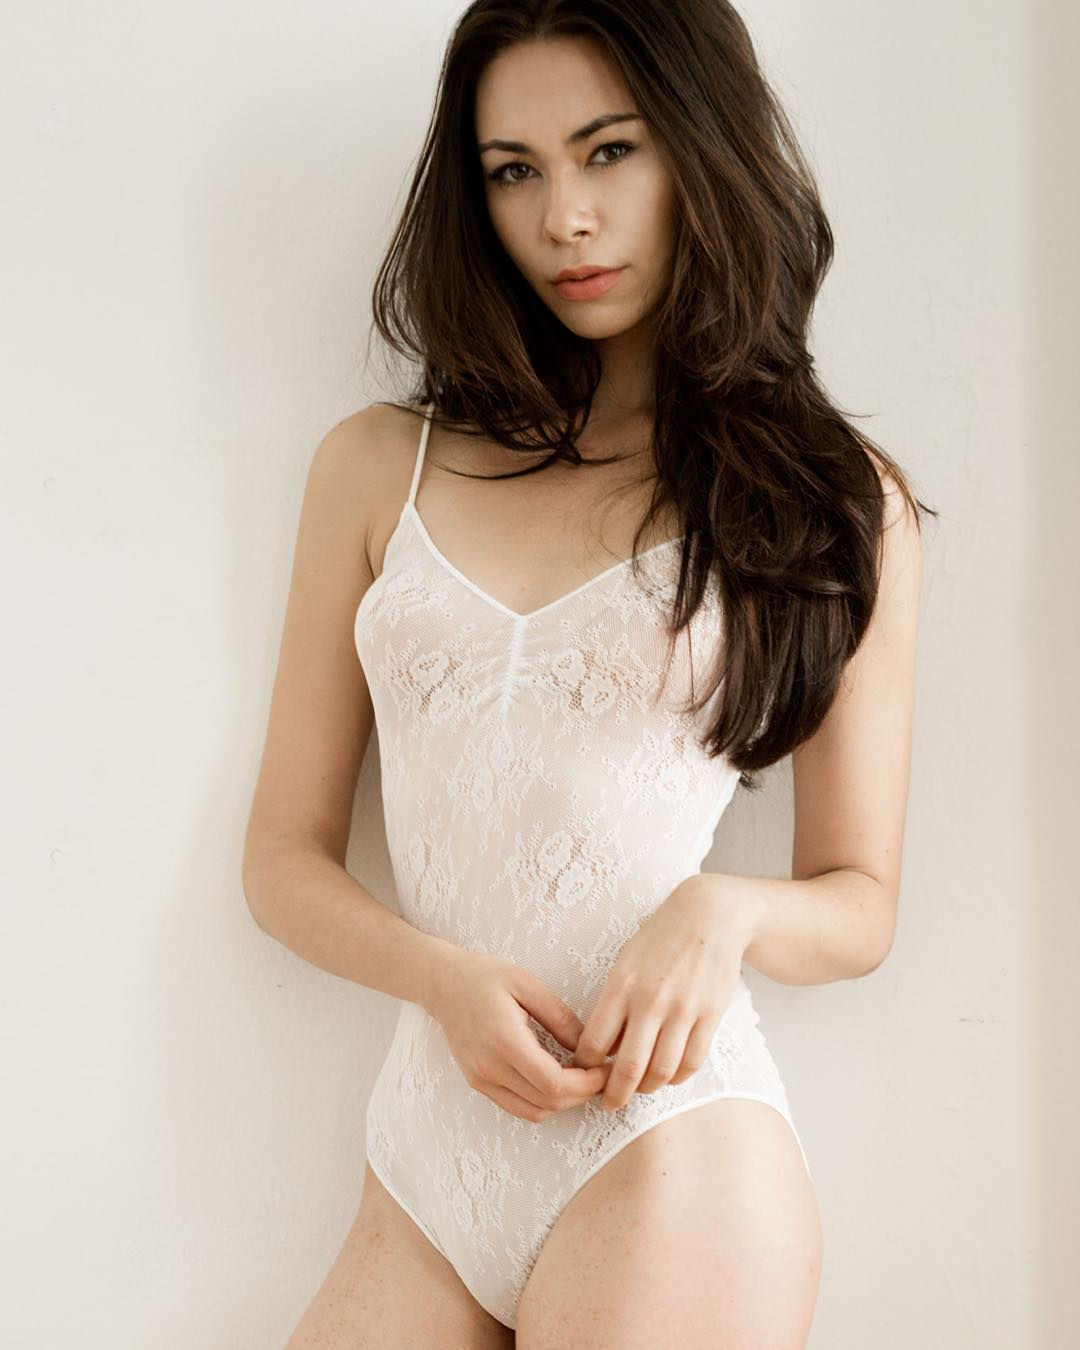 Angelina5.jpg